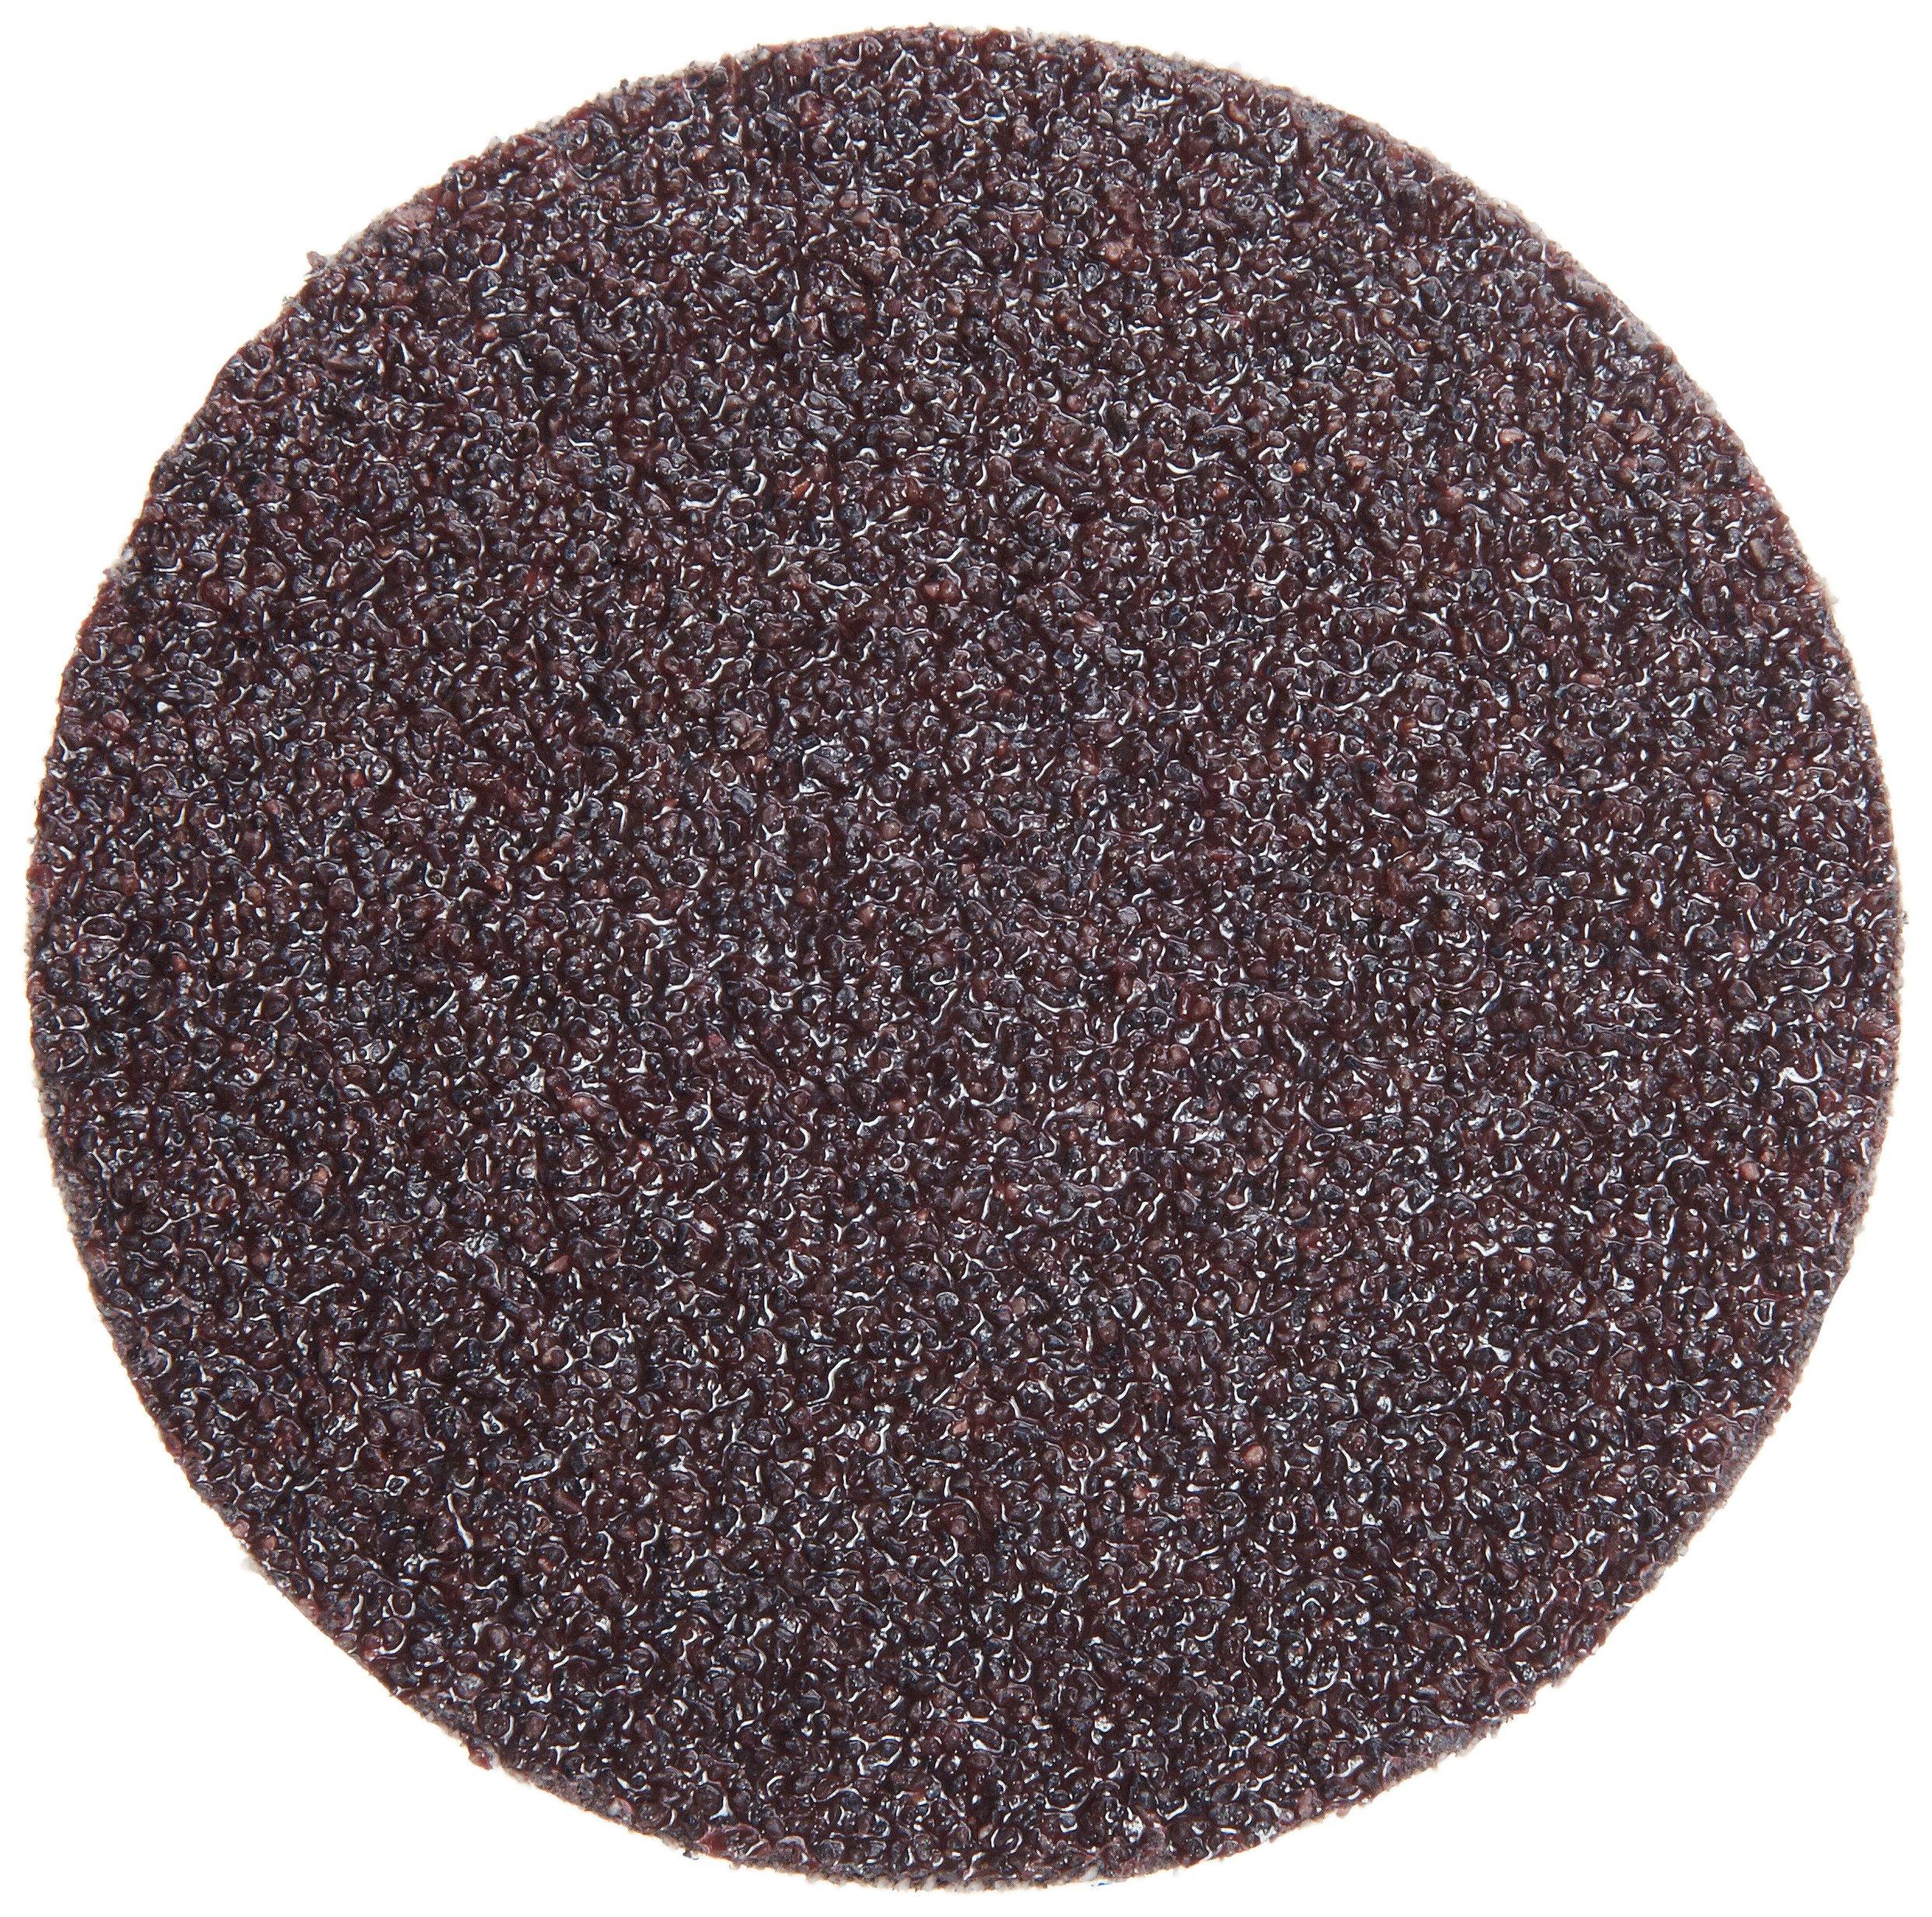 3M Roloc Disc 361F, Cloth, TR Attachment, Aluminum Oxide, 3'' Diameter, 36 Grit (Pack of 50)